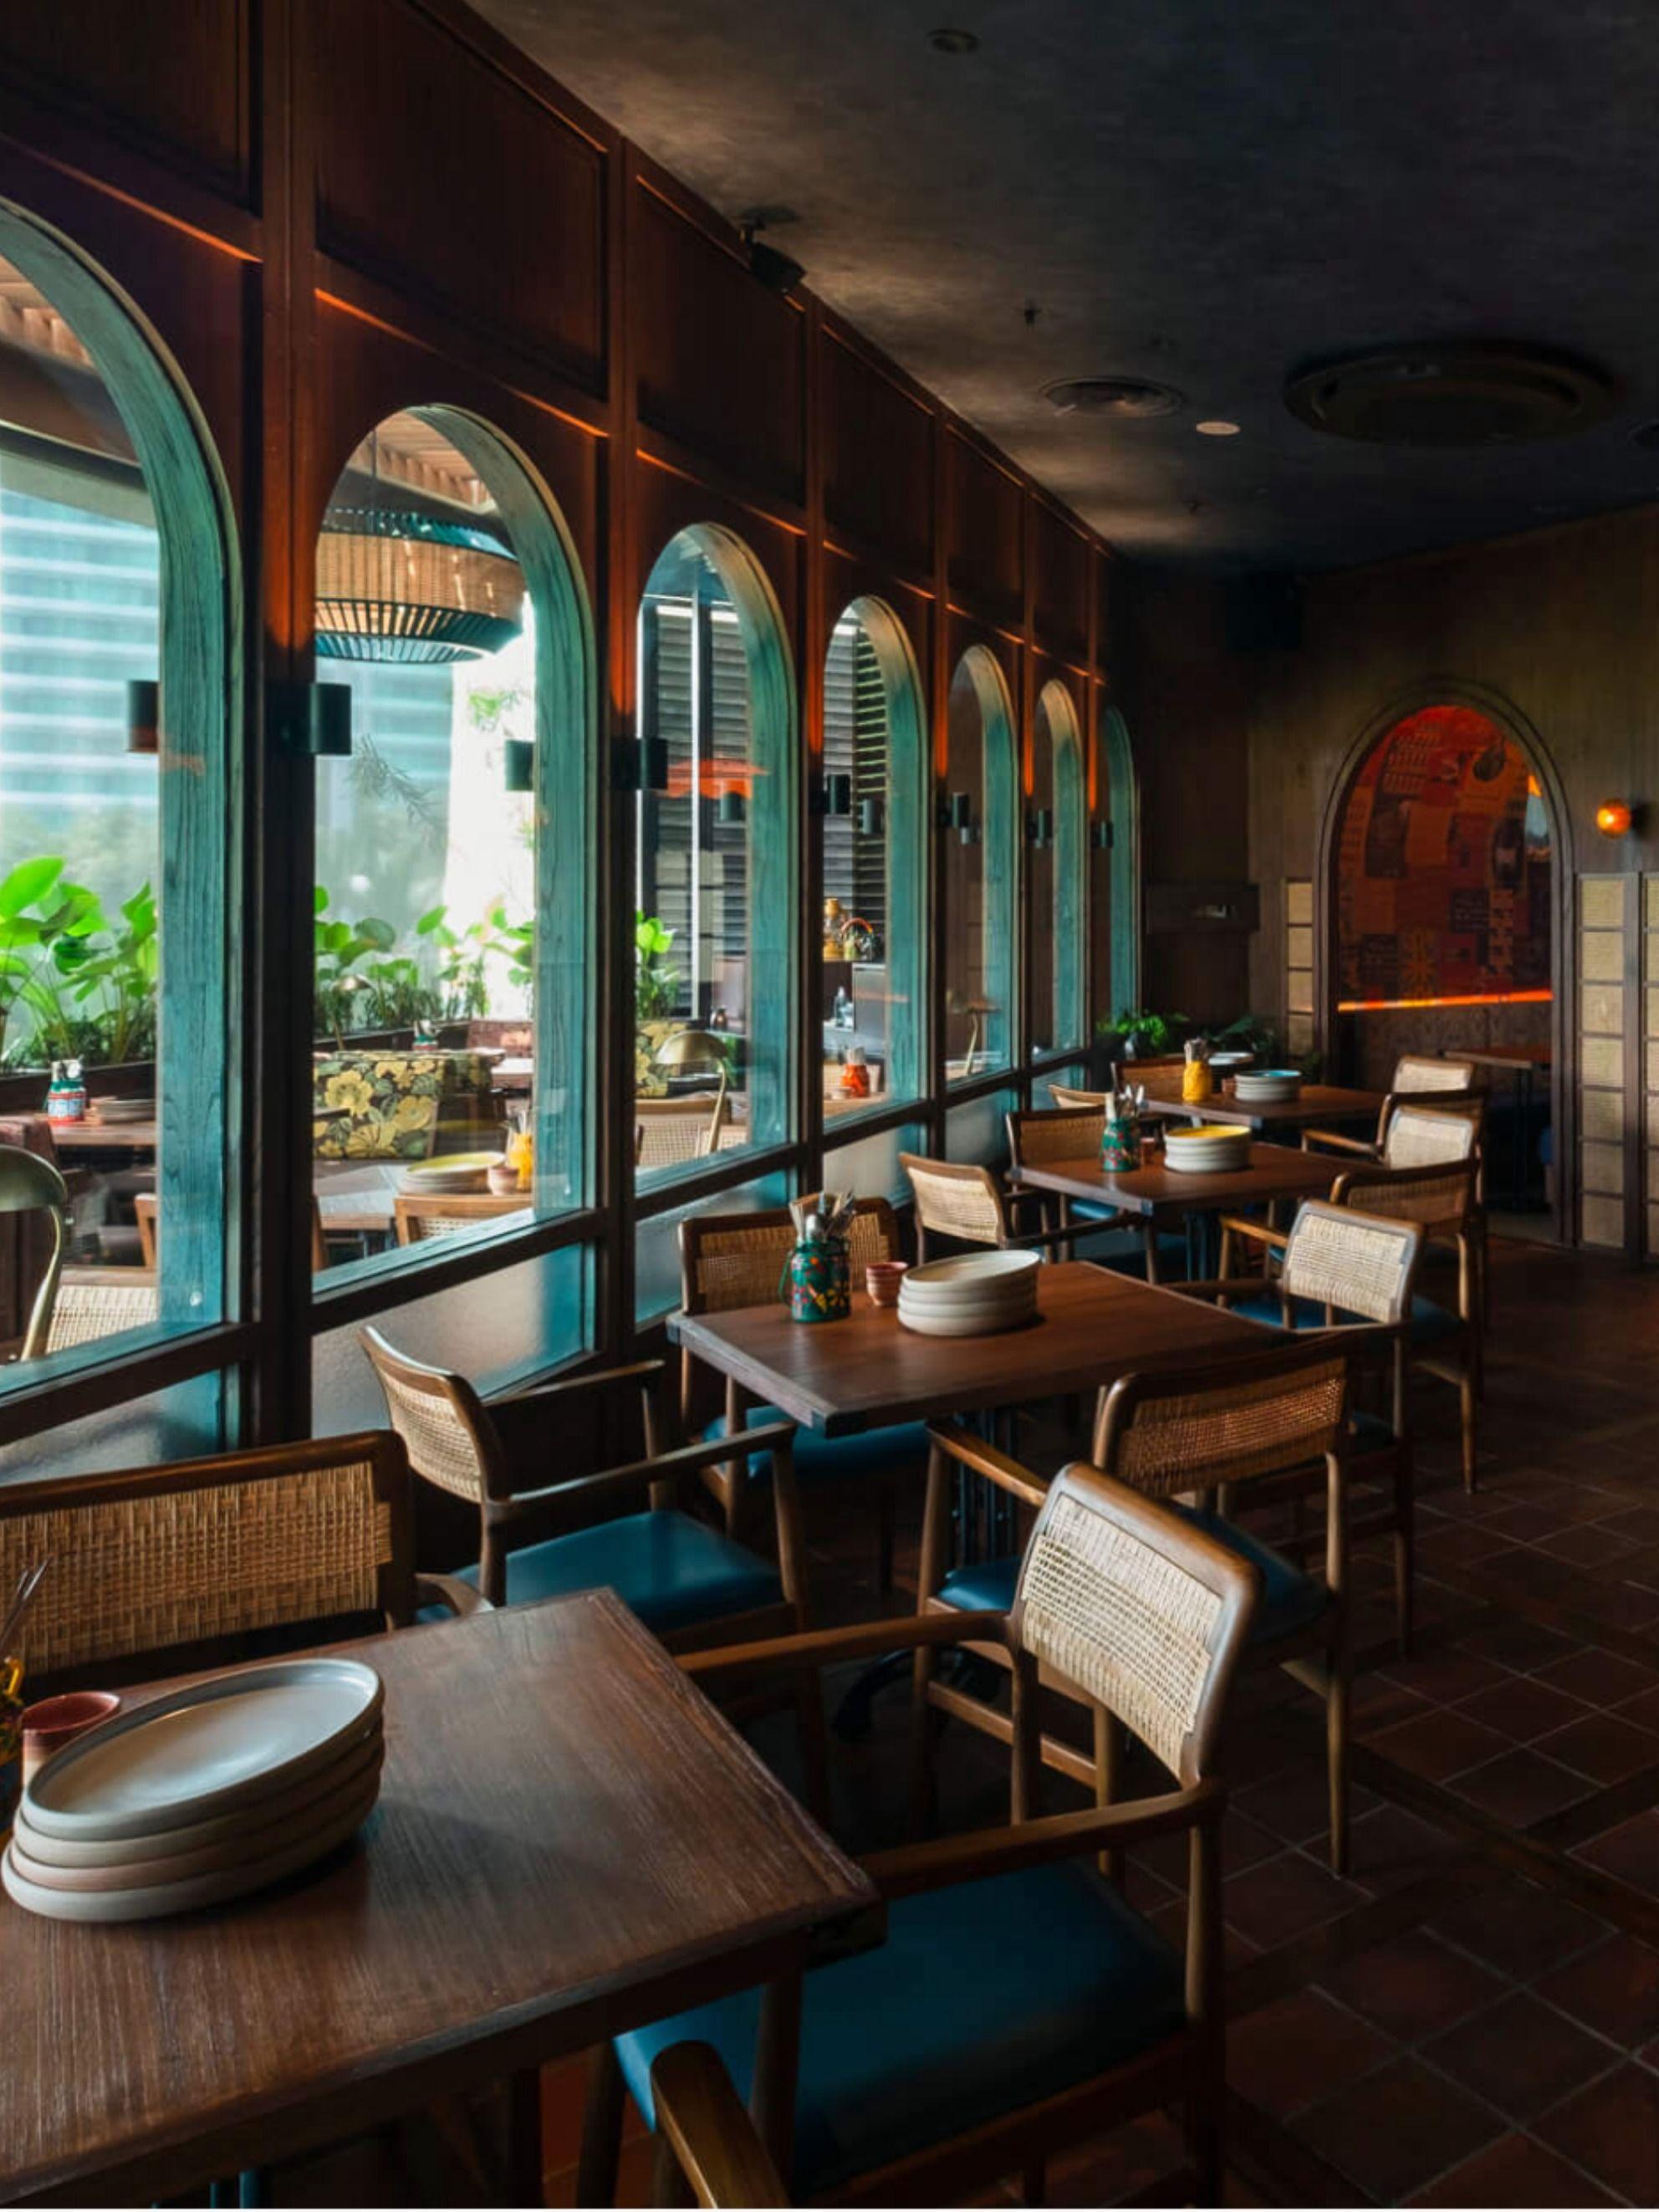 Gunpowder Kitchen And Bar Jakarta Indian Cuisine 1st Floor Plaza Indonesia Jl M H Thamrin No Kav 28 30 Jakarta Pusat